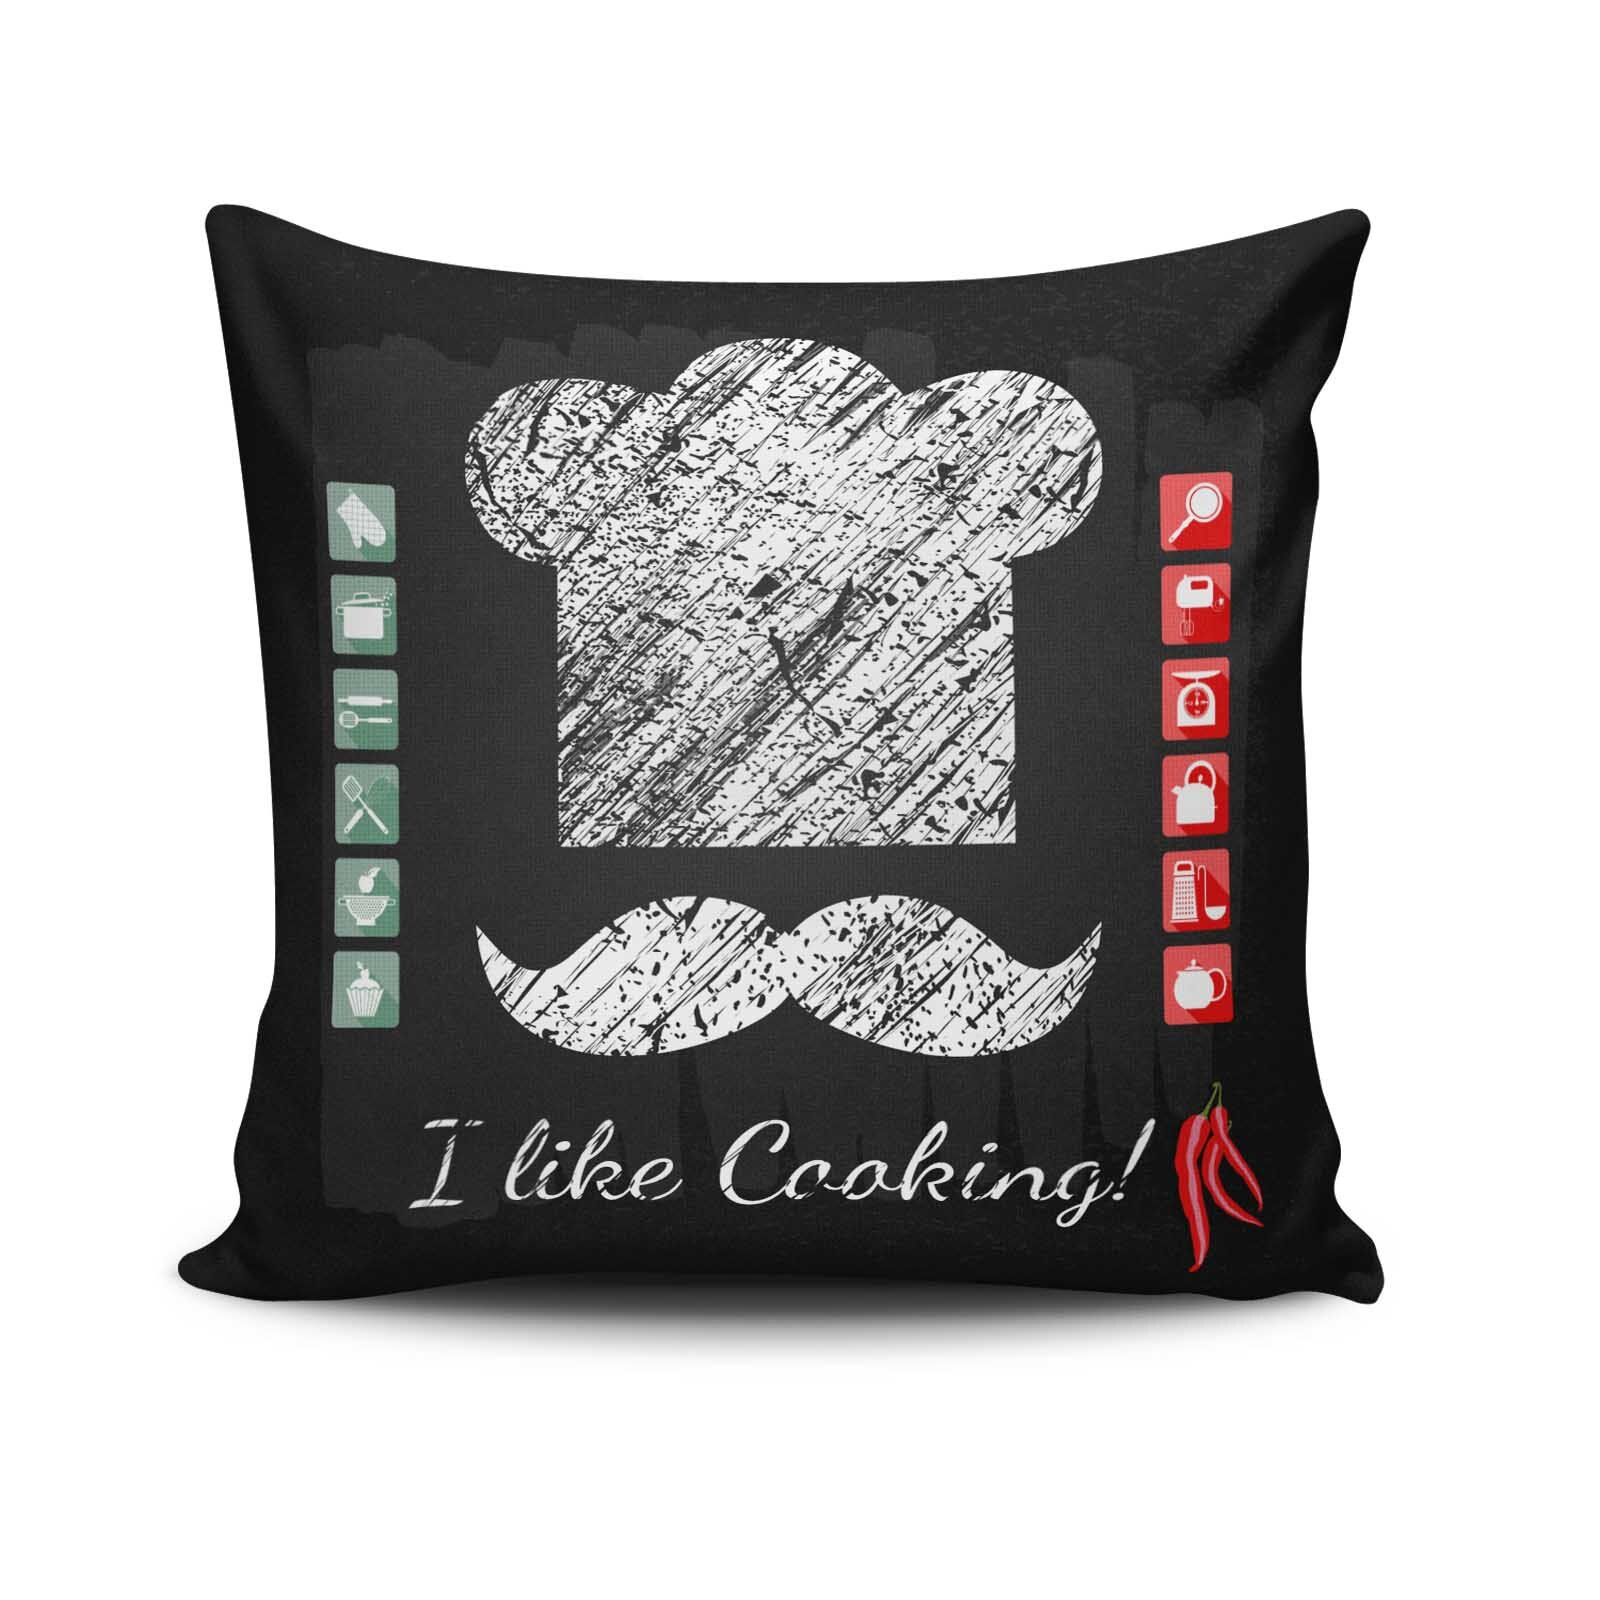 Perna decorativa Cushion Love, Dimensiune: 45 x 45 cm, Material exterior: 50% bumbac / 50% poliester 768CLV0205